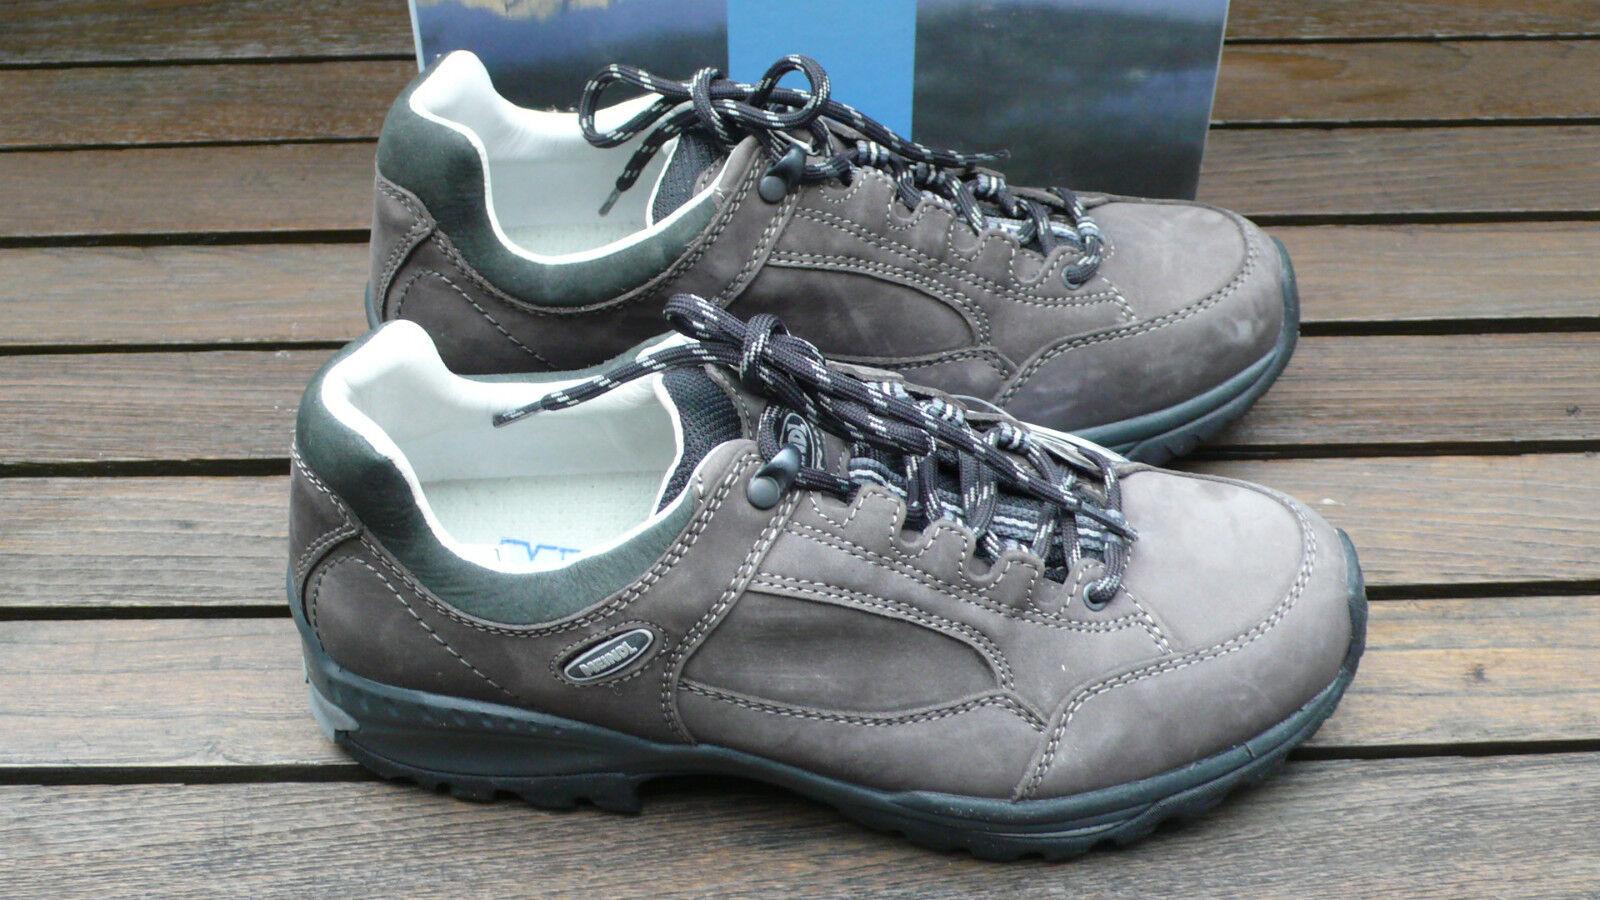 Meindl Trekkingschuh LaROTo Lady, Größe UK 8 - EUR 42  Farbe: grau anthrazit